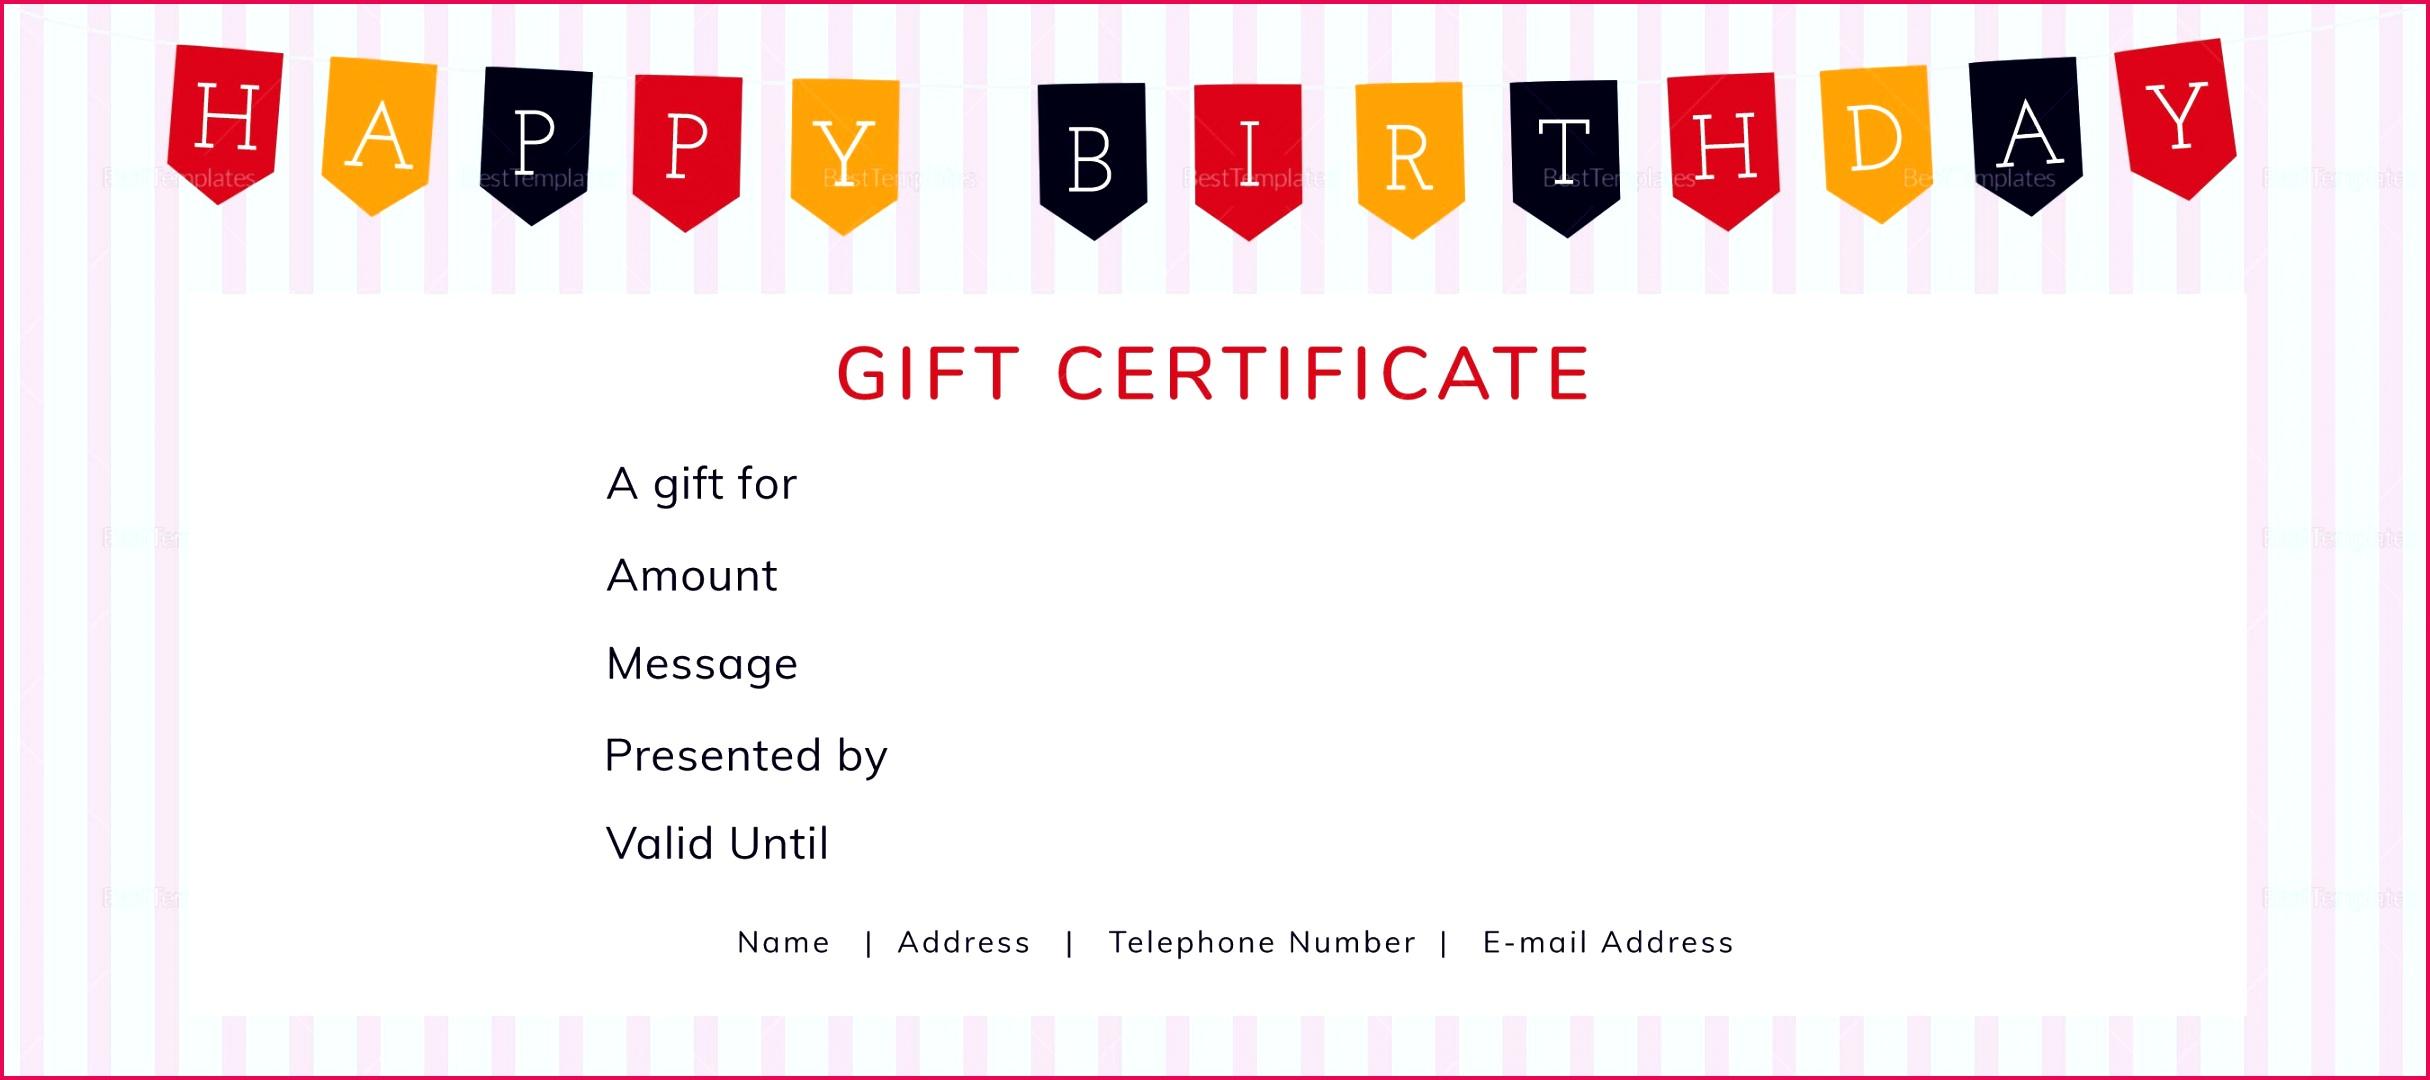 004 template ideas birthday t voucher word ulyssesroom best of happy certificate